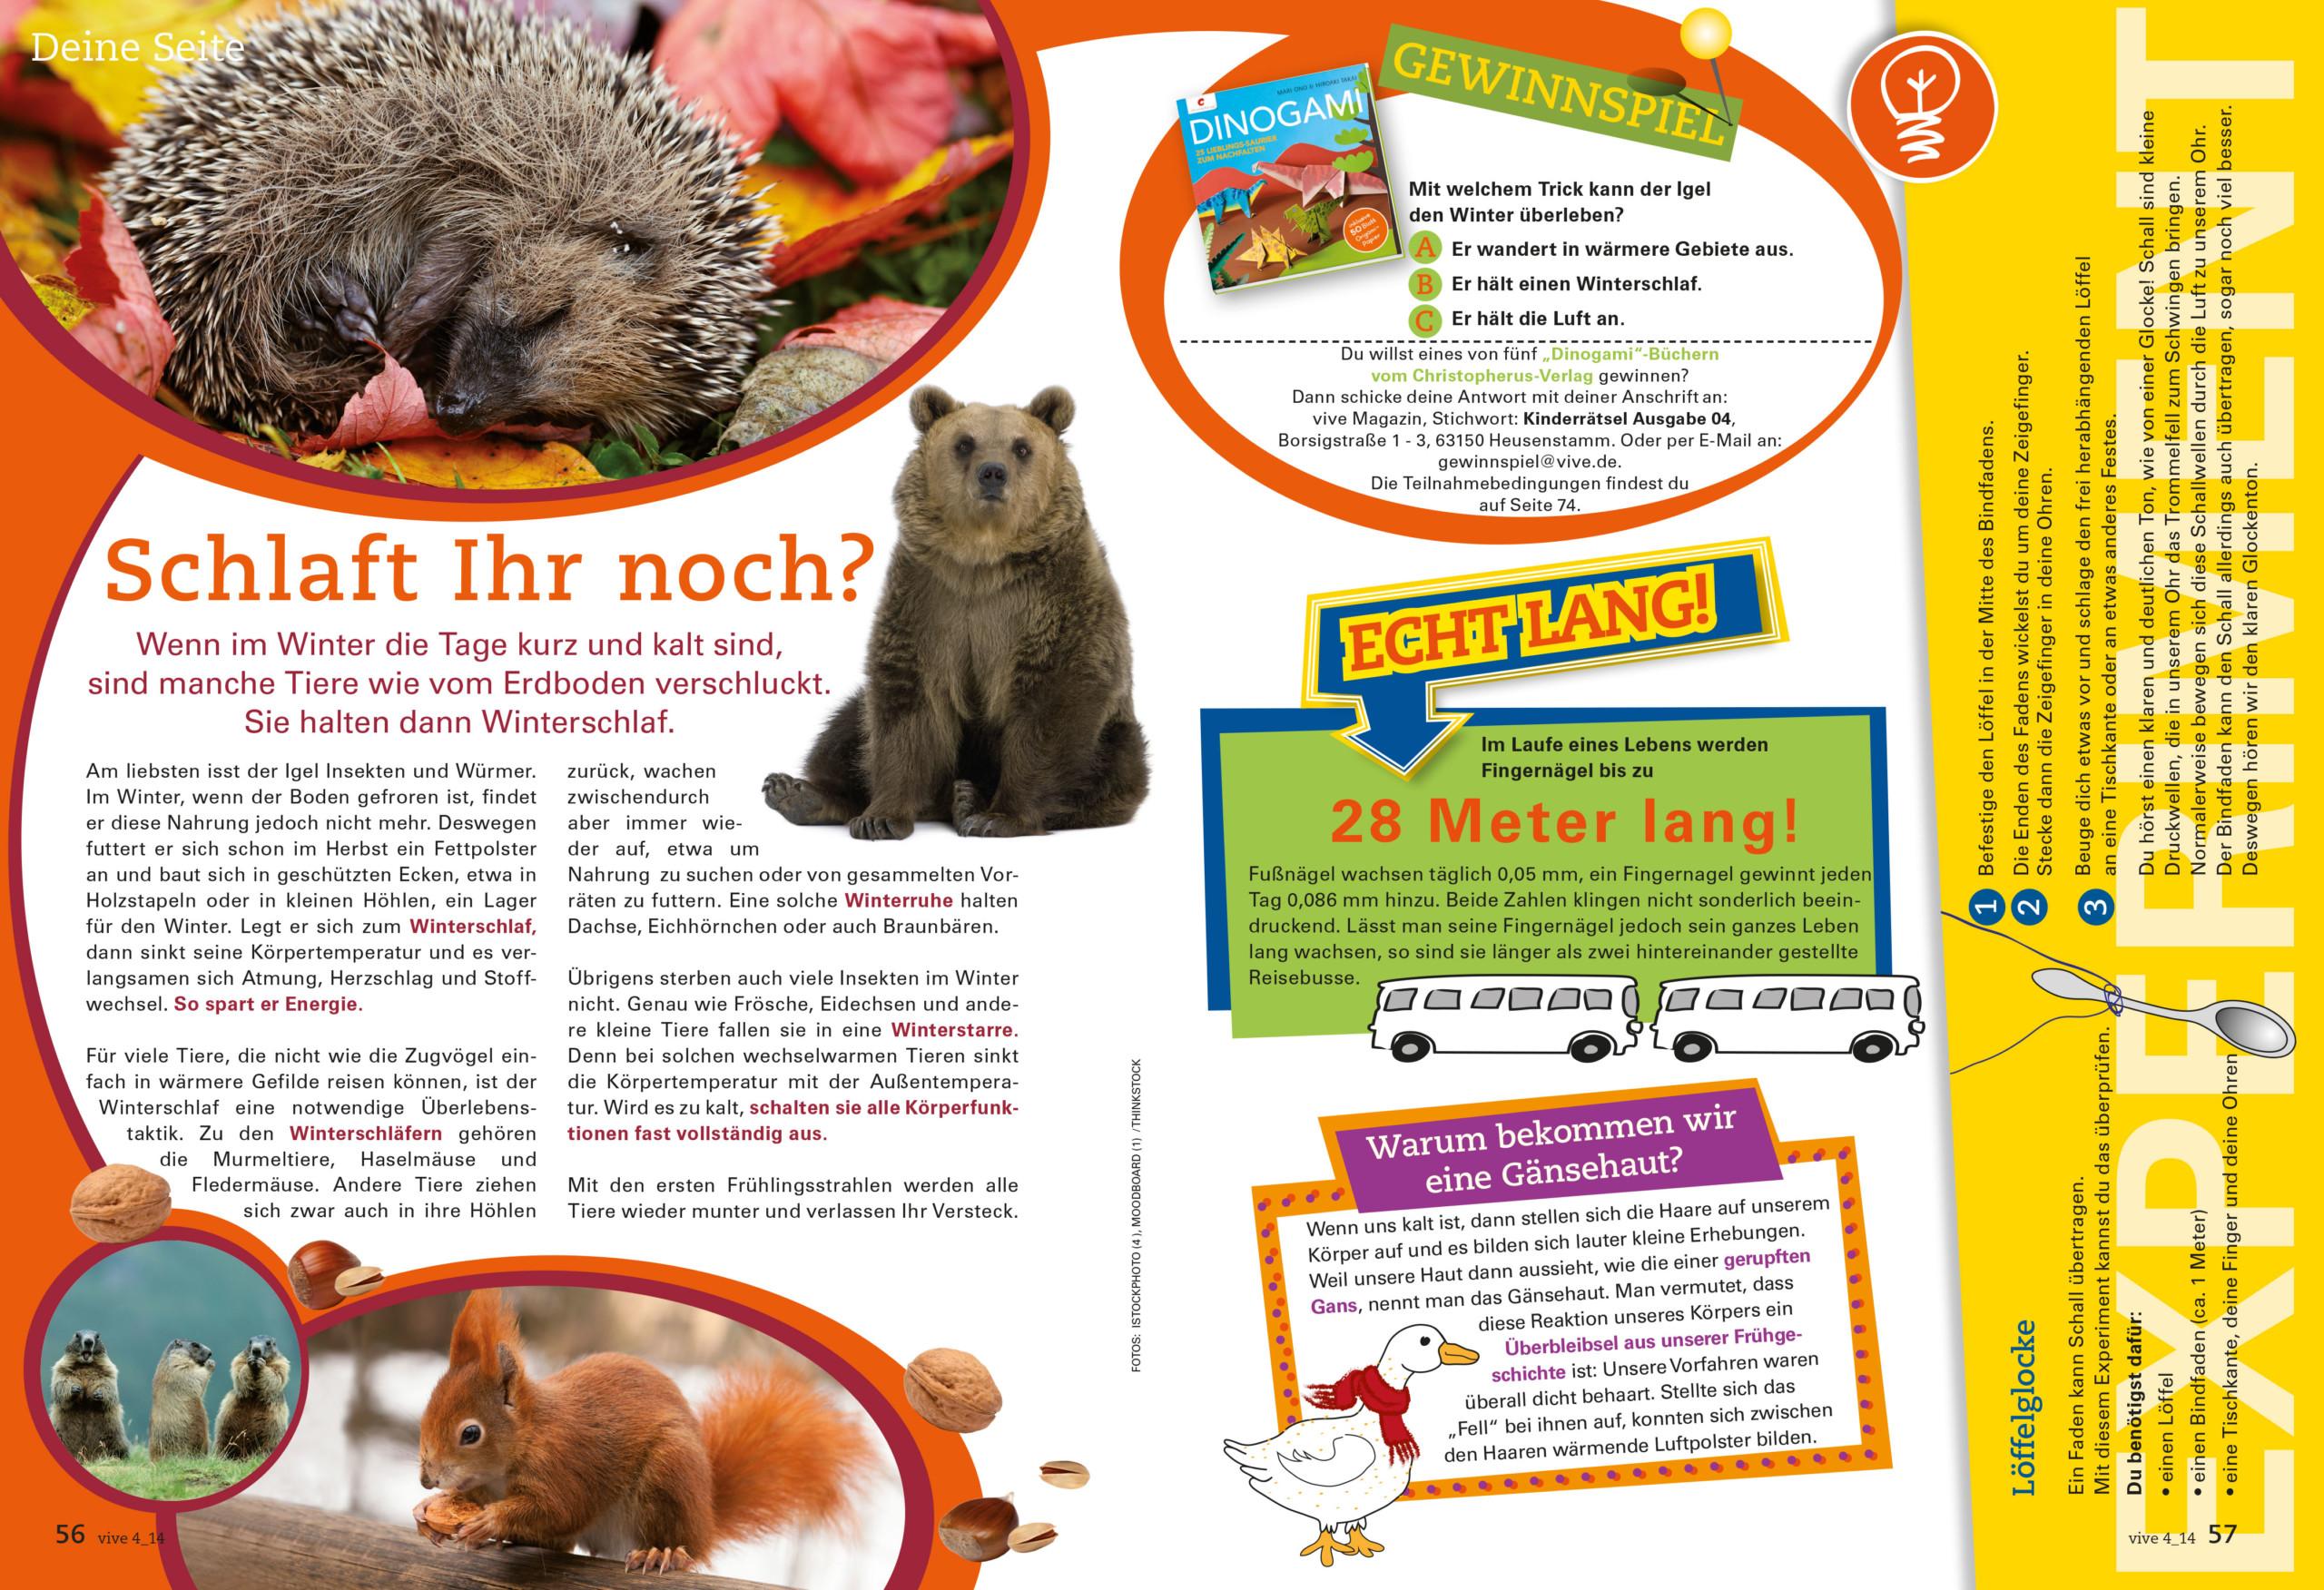 VIVE / ALPHEGA Kundenmagazin – Kinderseiten -Thema Winterschlaf